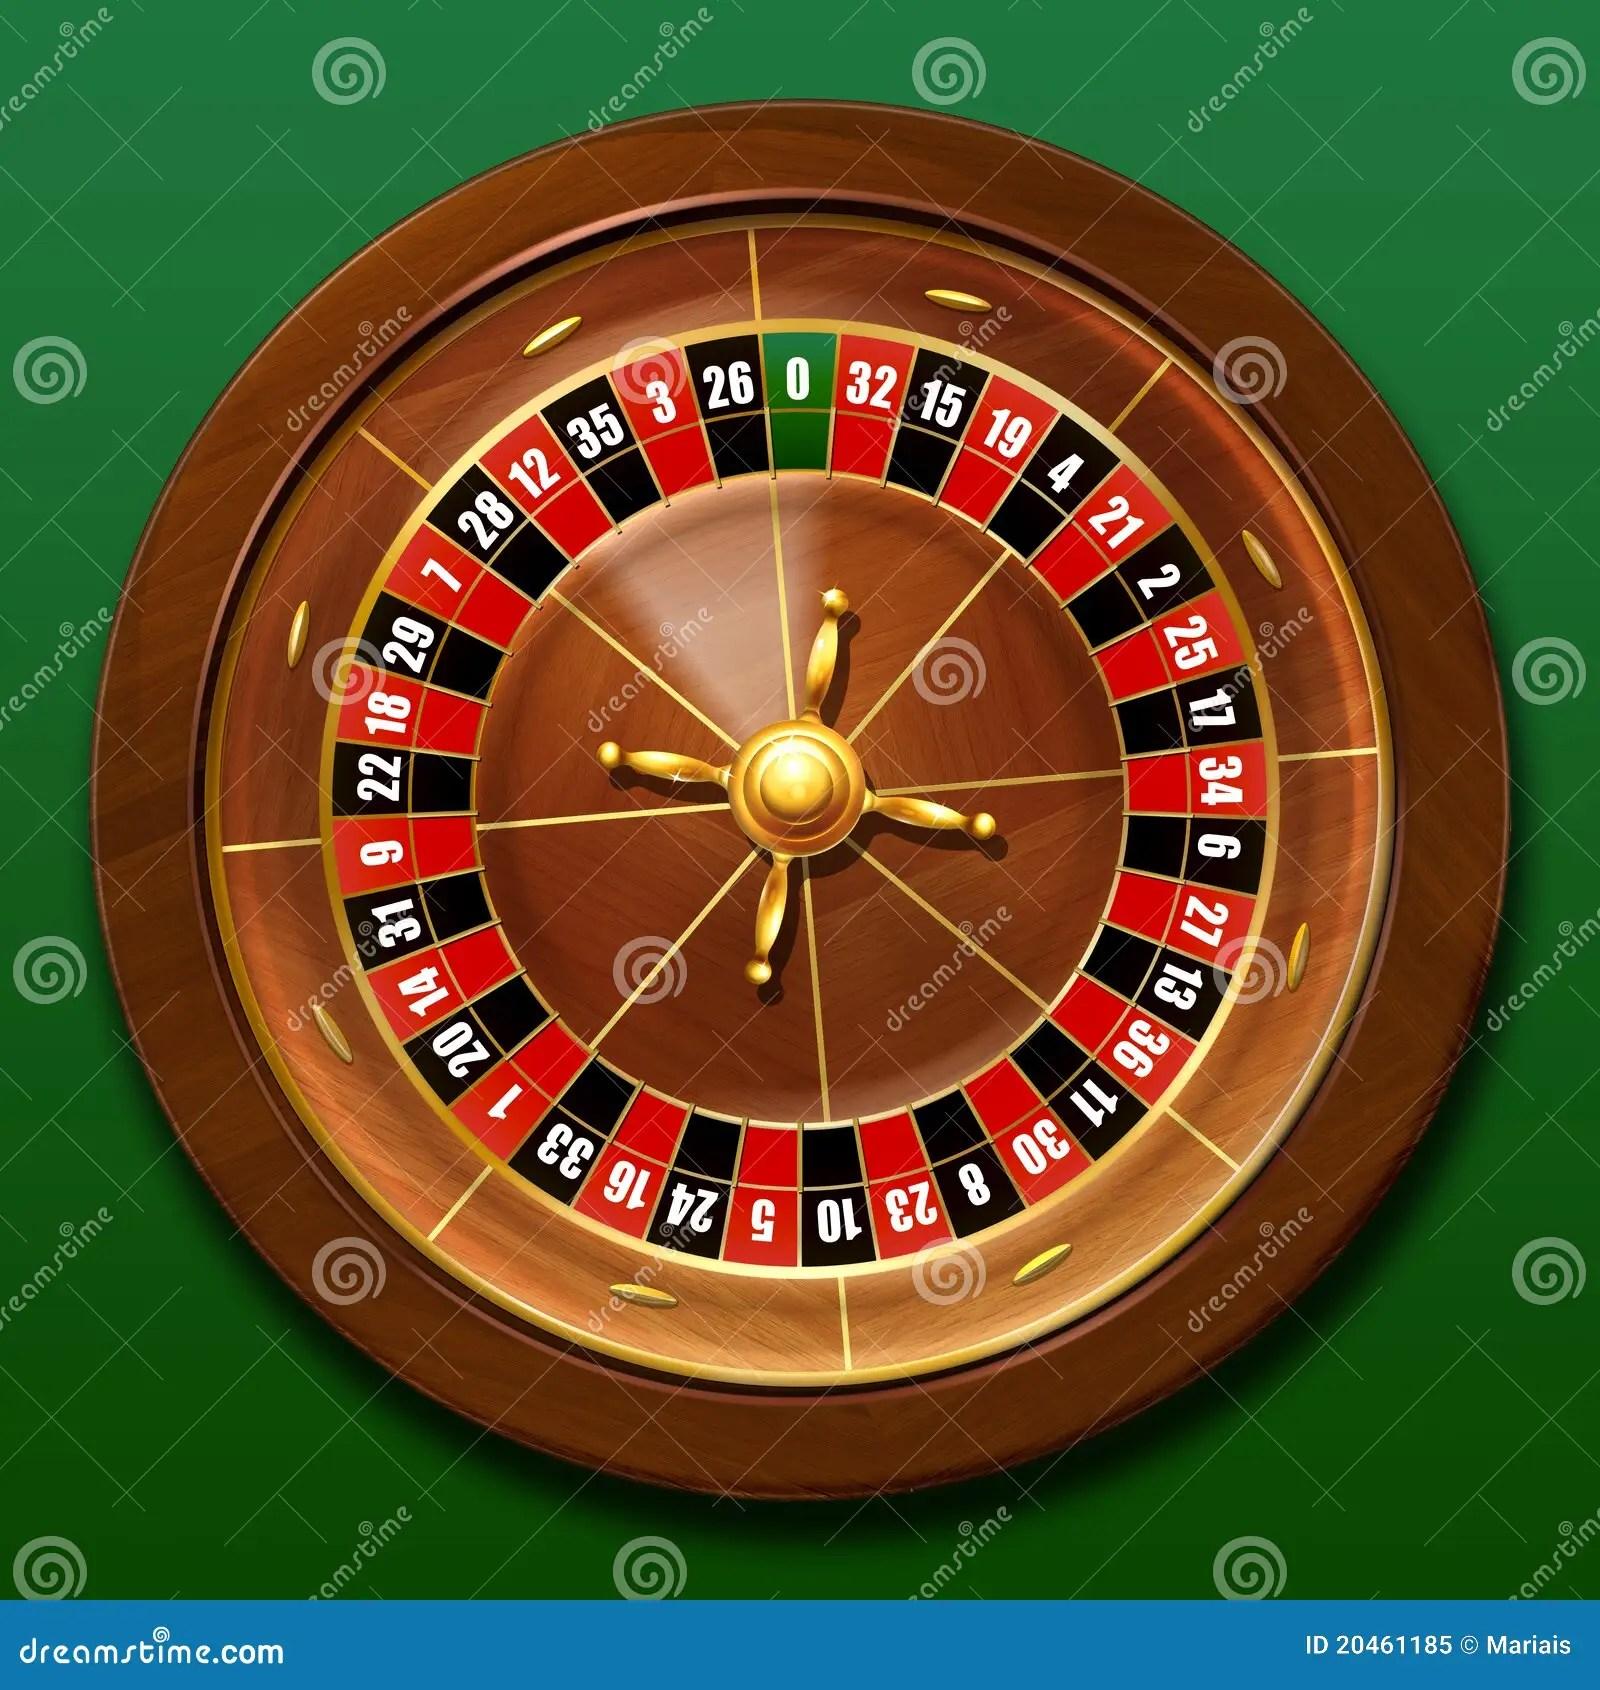 Gamble Games Wheels